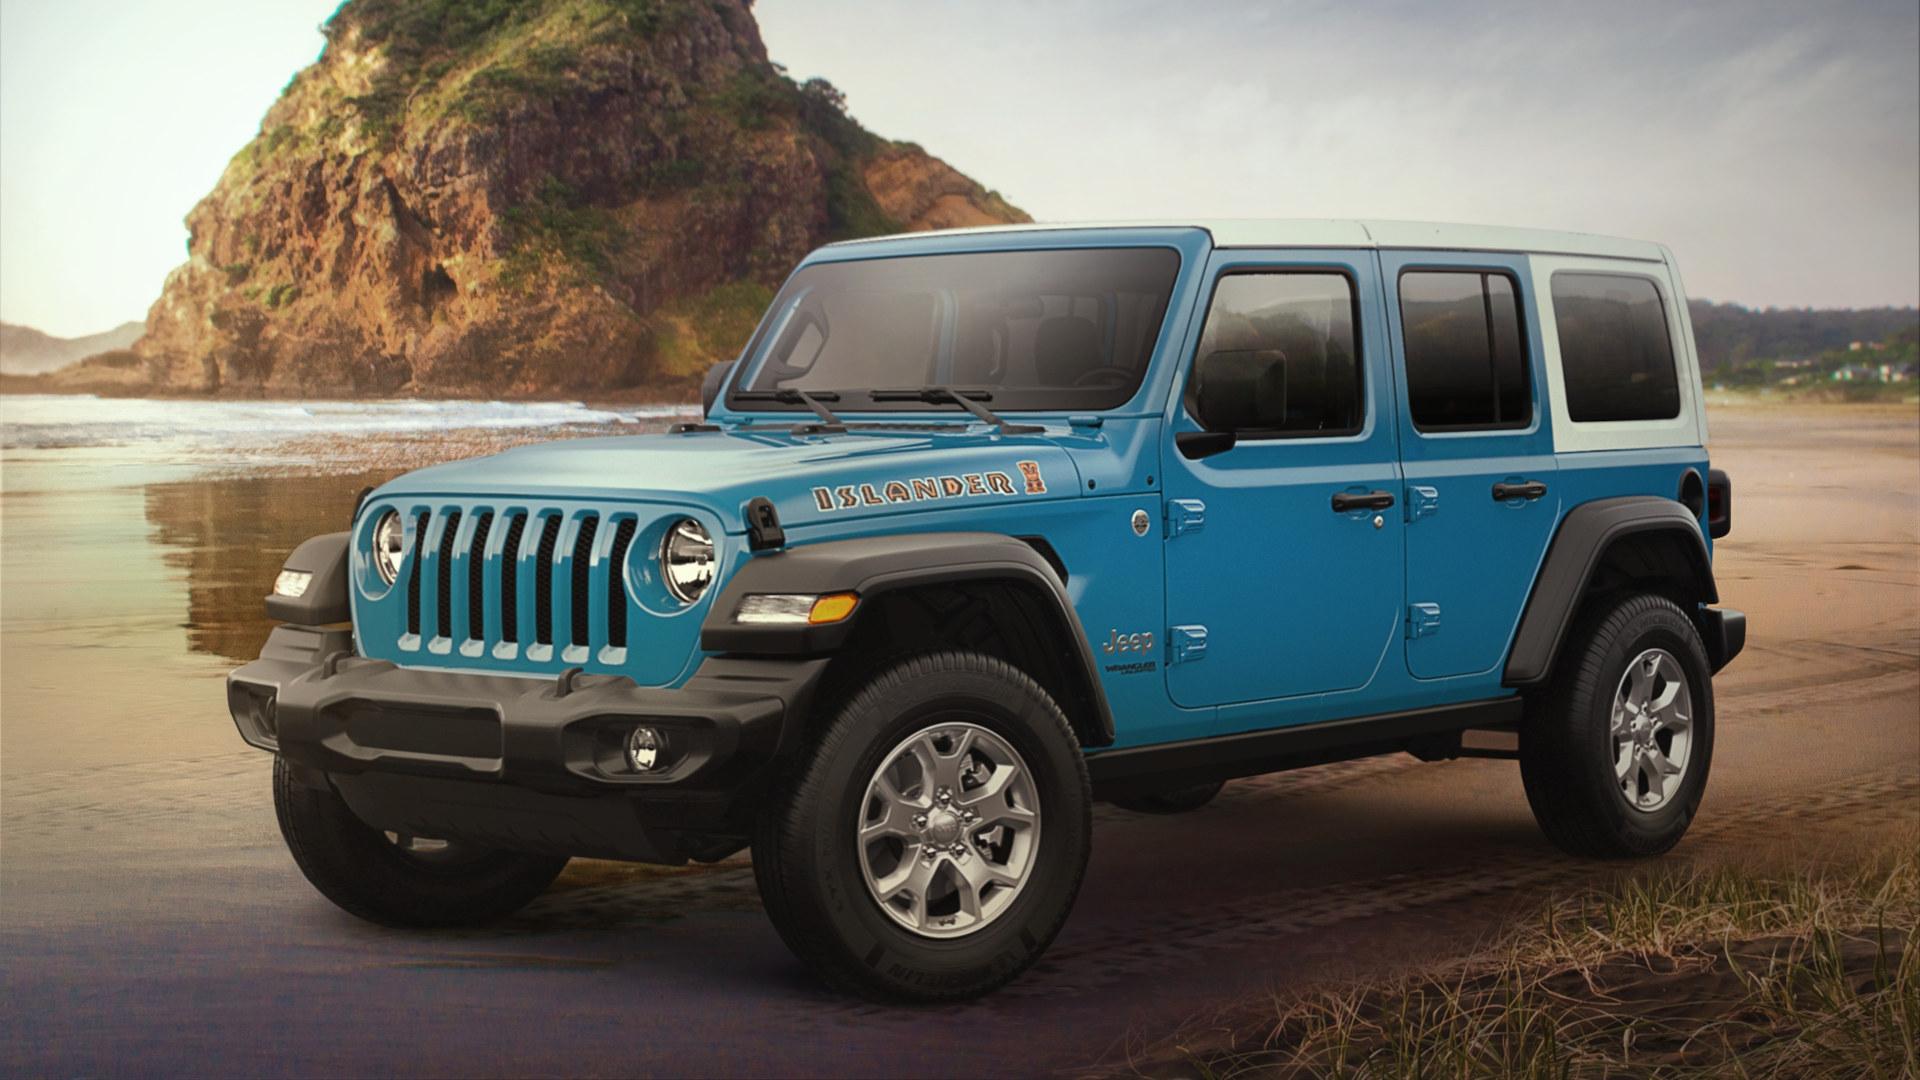 The Jeep Renegade Islander